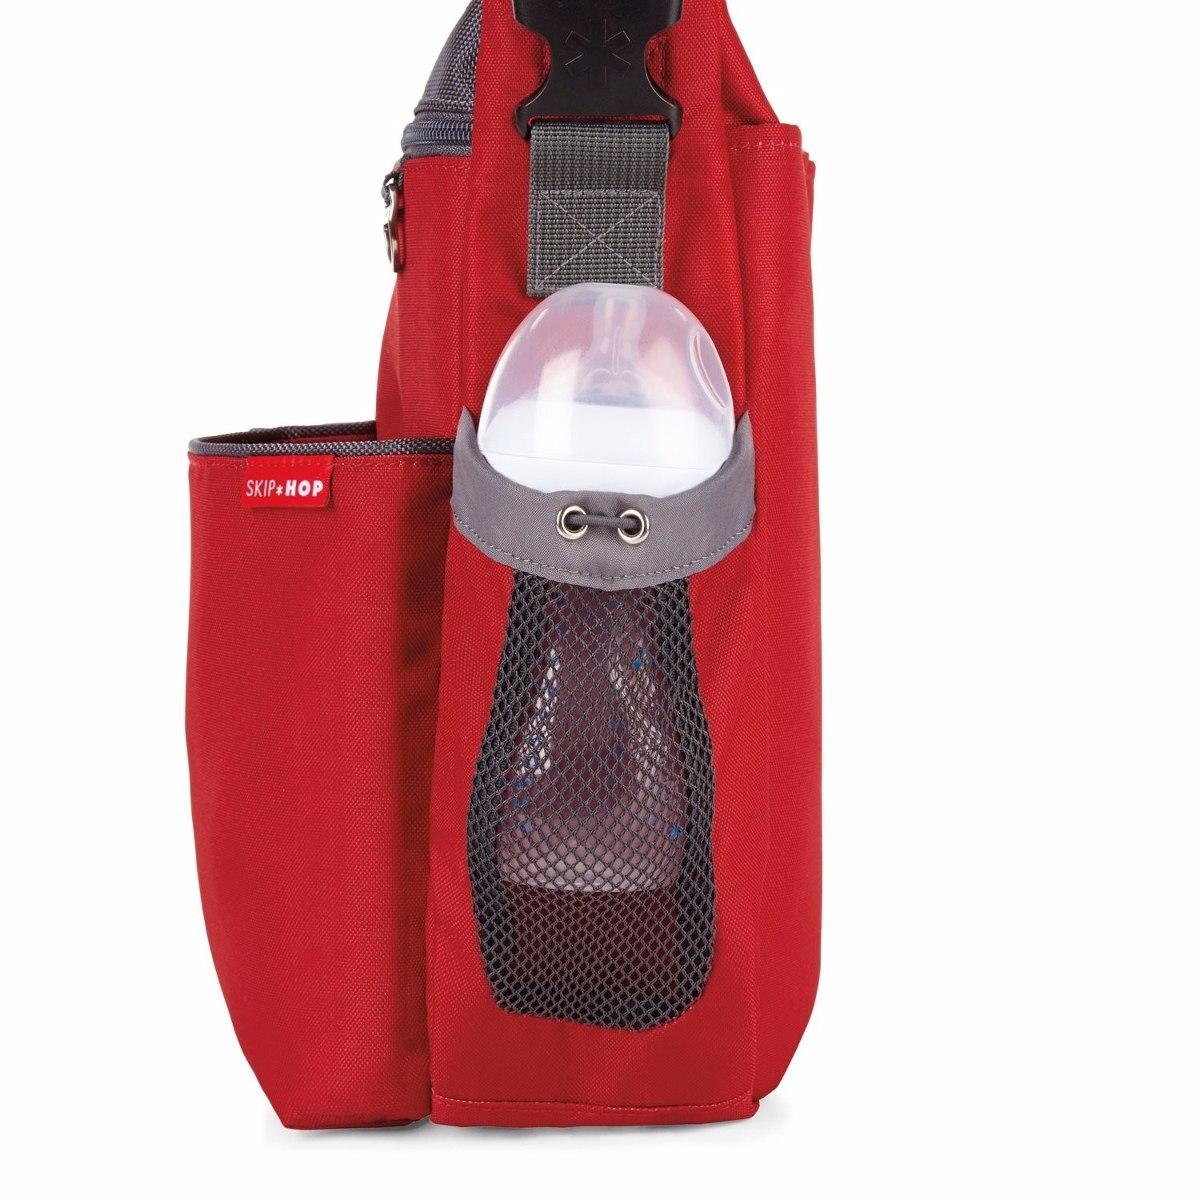 8492c4bc9 skip hop bolsa pañalera bebé con cambiador moderna ropa roja. Cargando zoom.